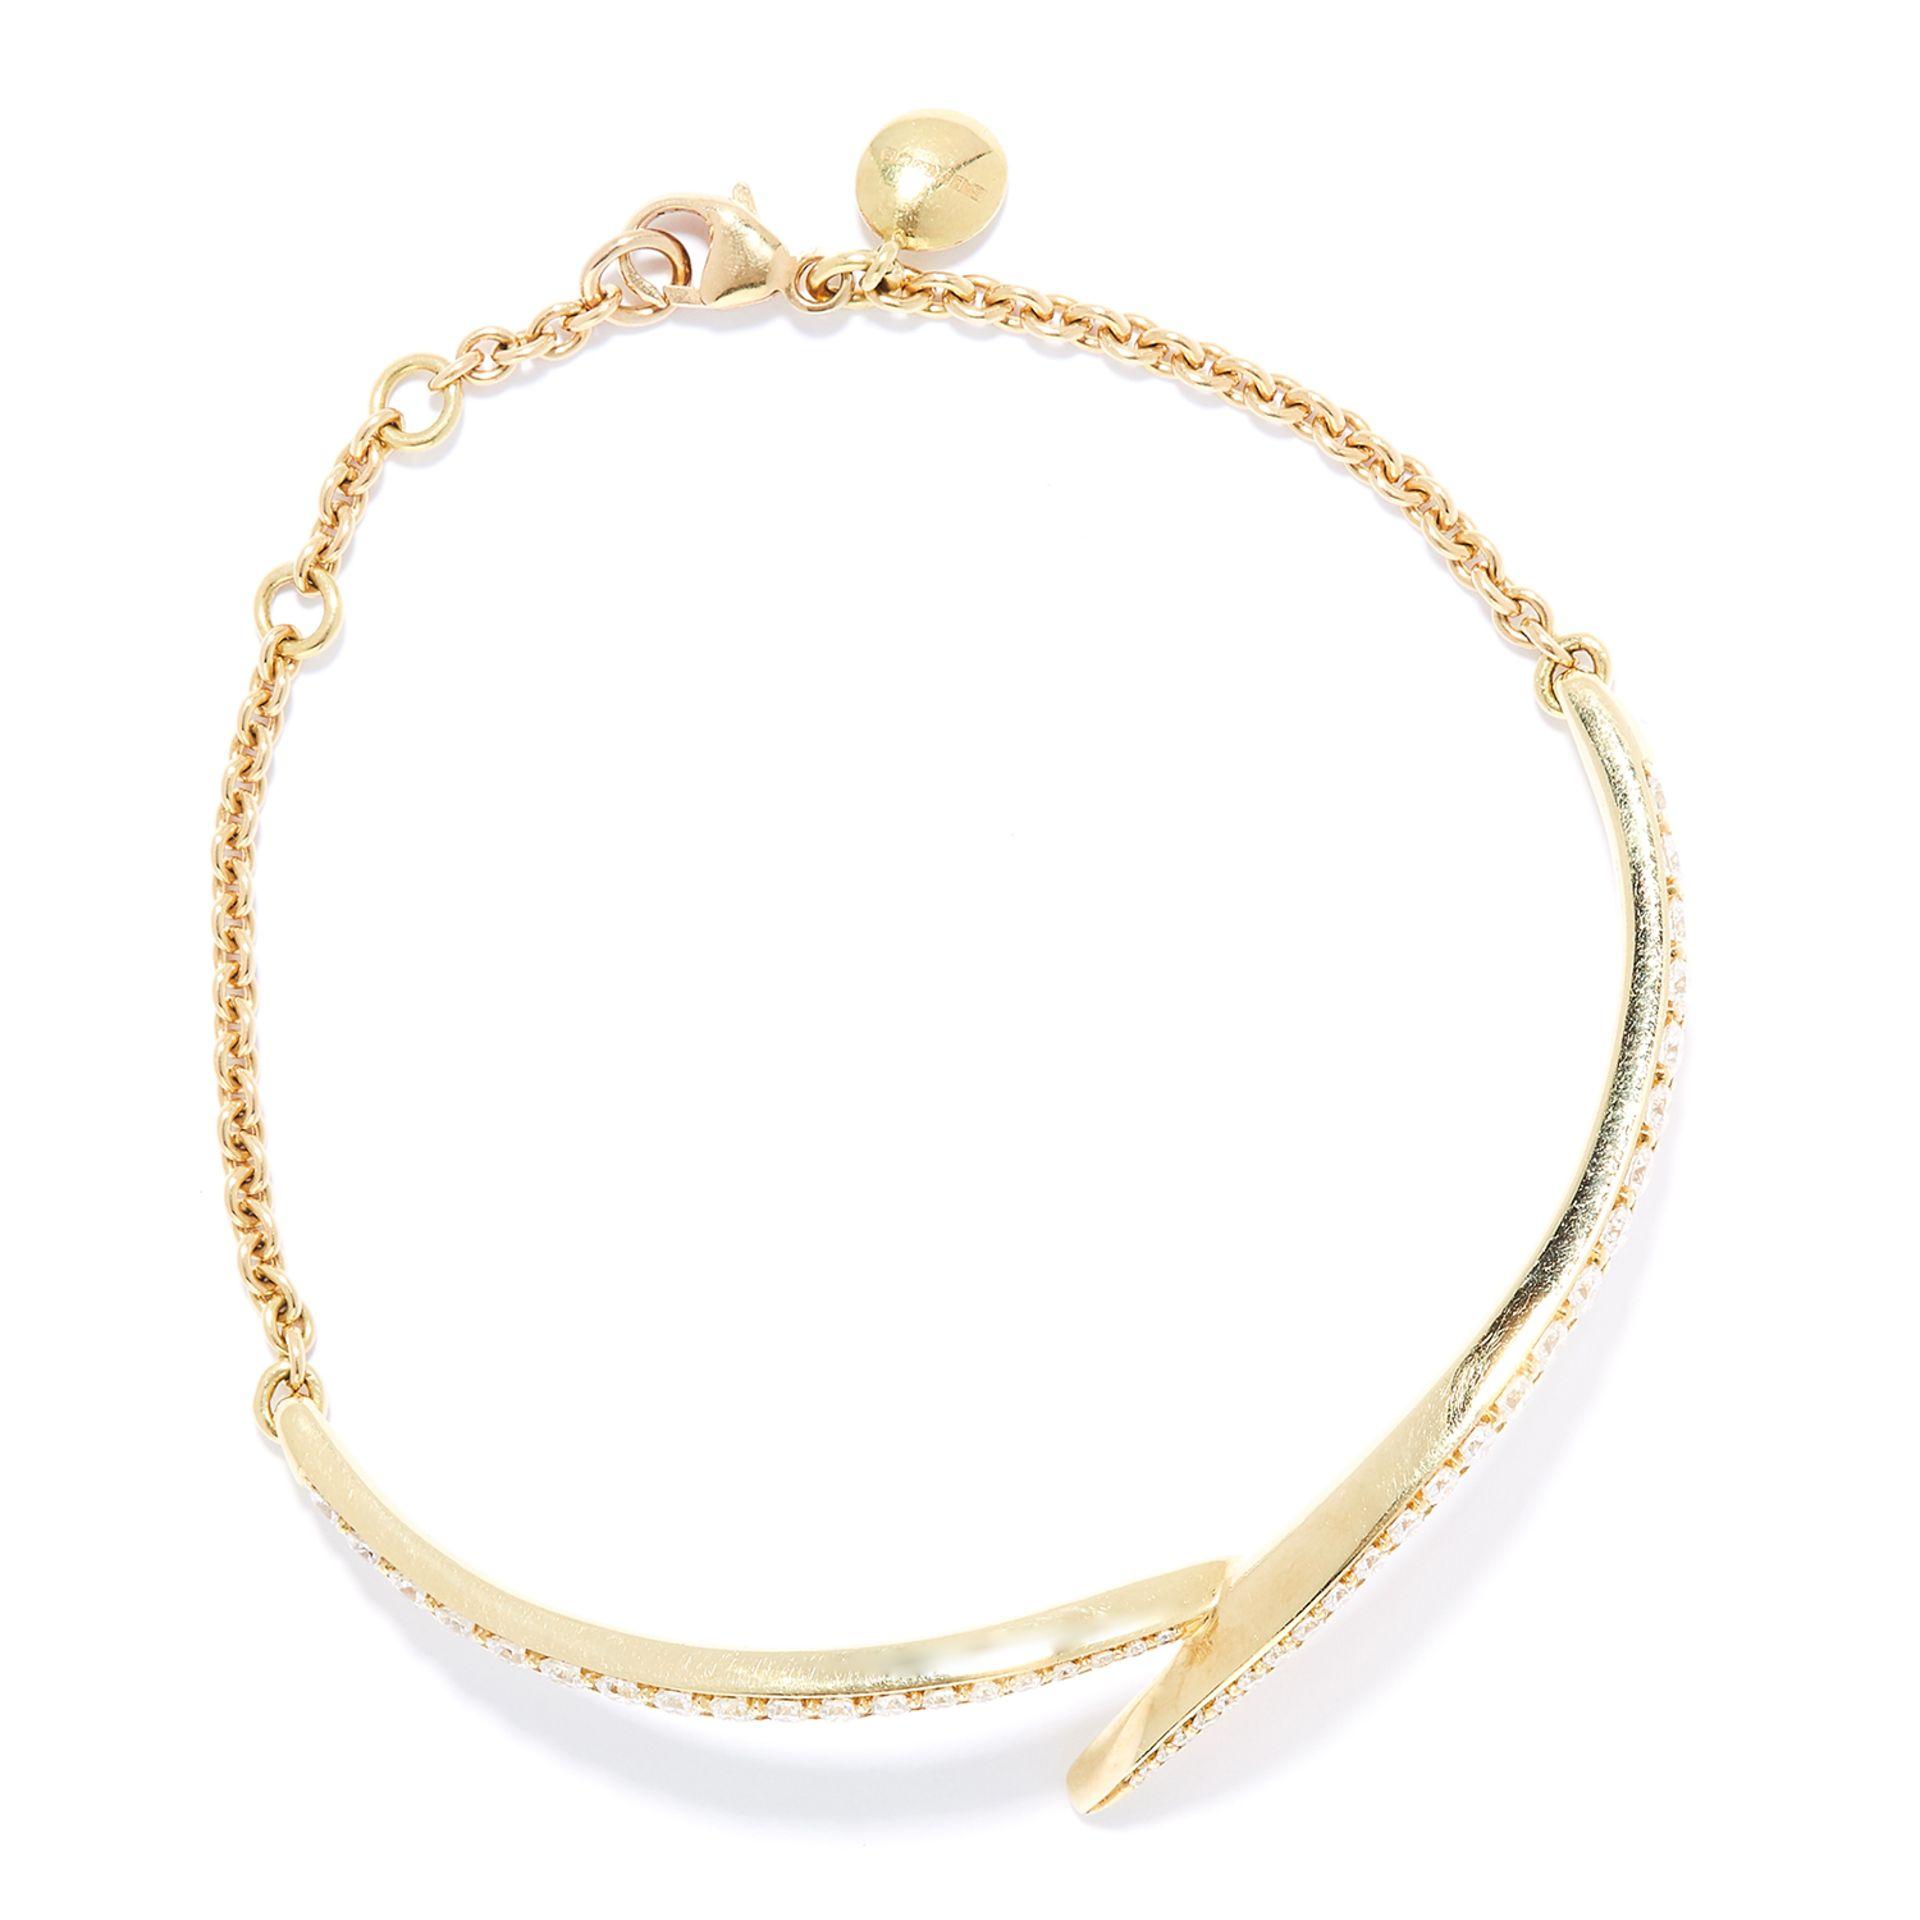 DIAMOND BRACELET, SEANE LEANE in 18ct yellow gold, set with a row of round cut diamonds in half - Bild 2 aus 2